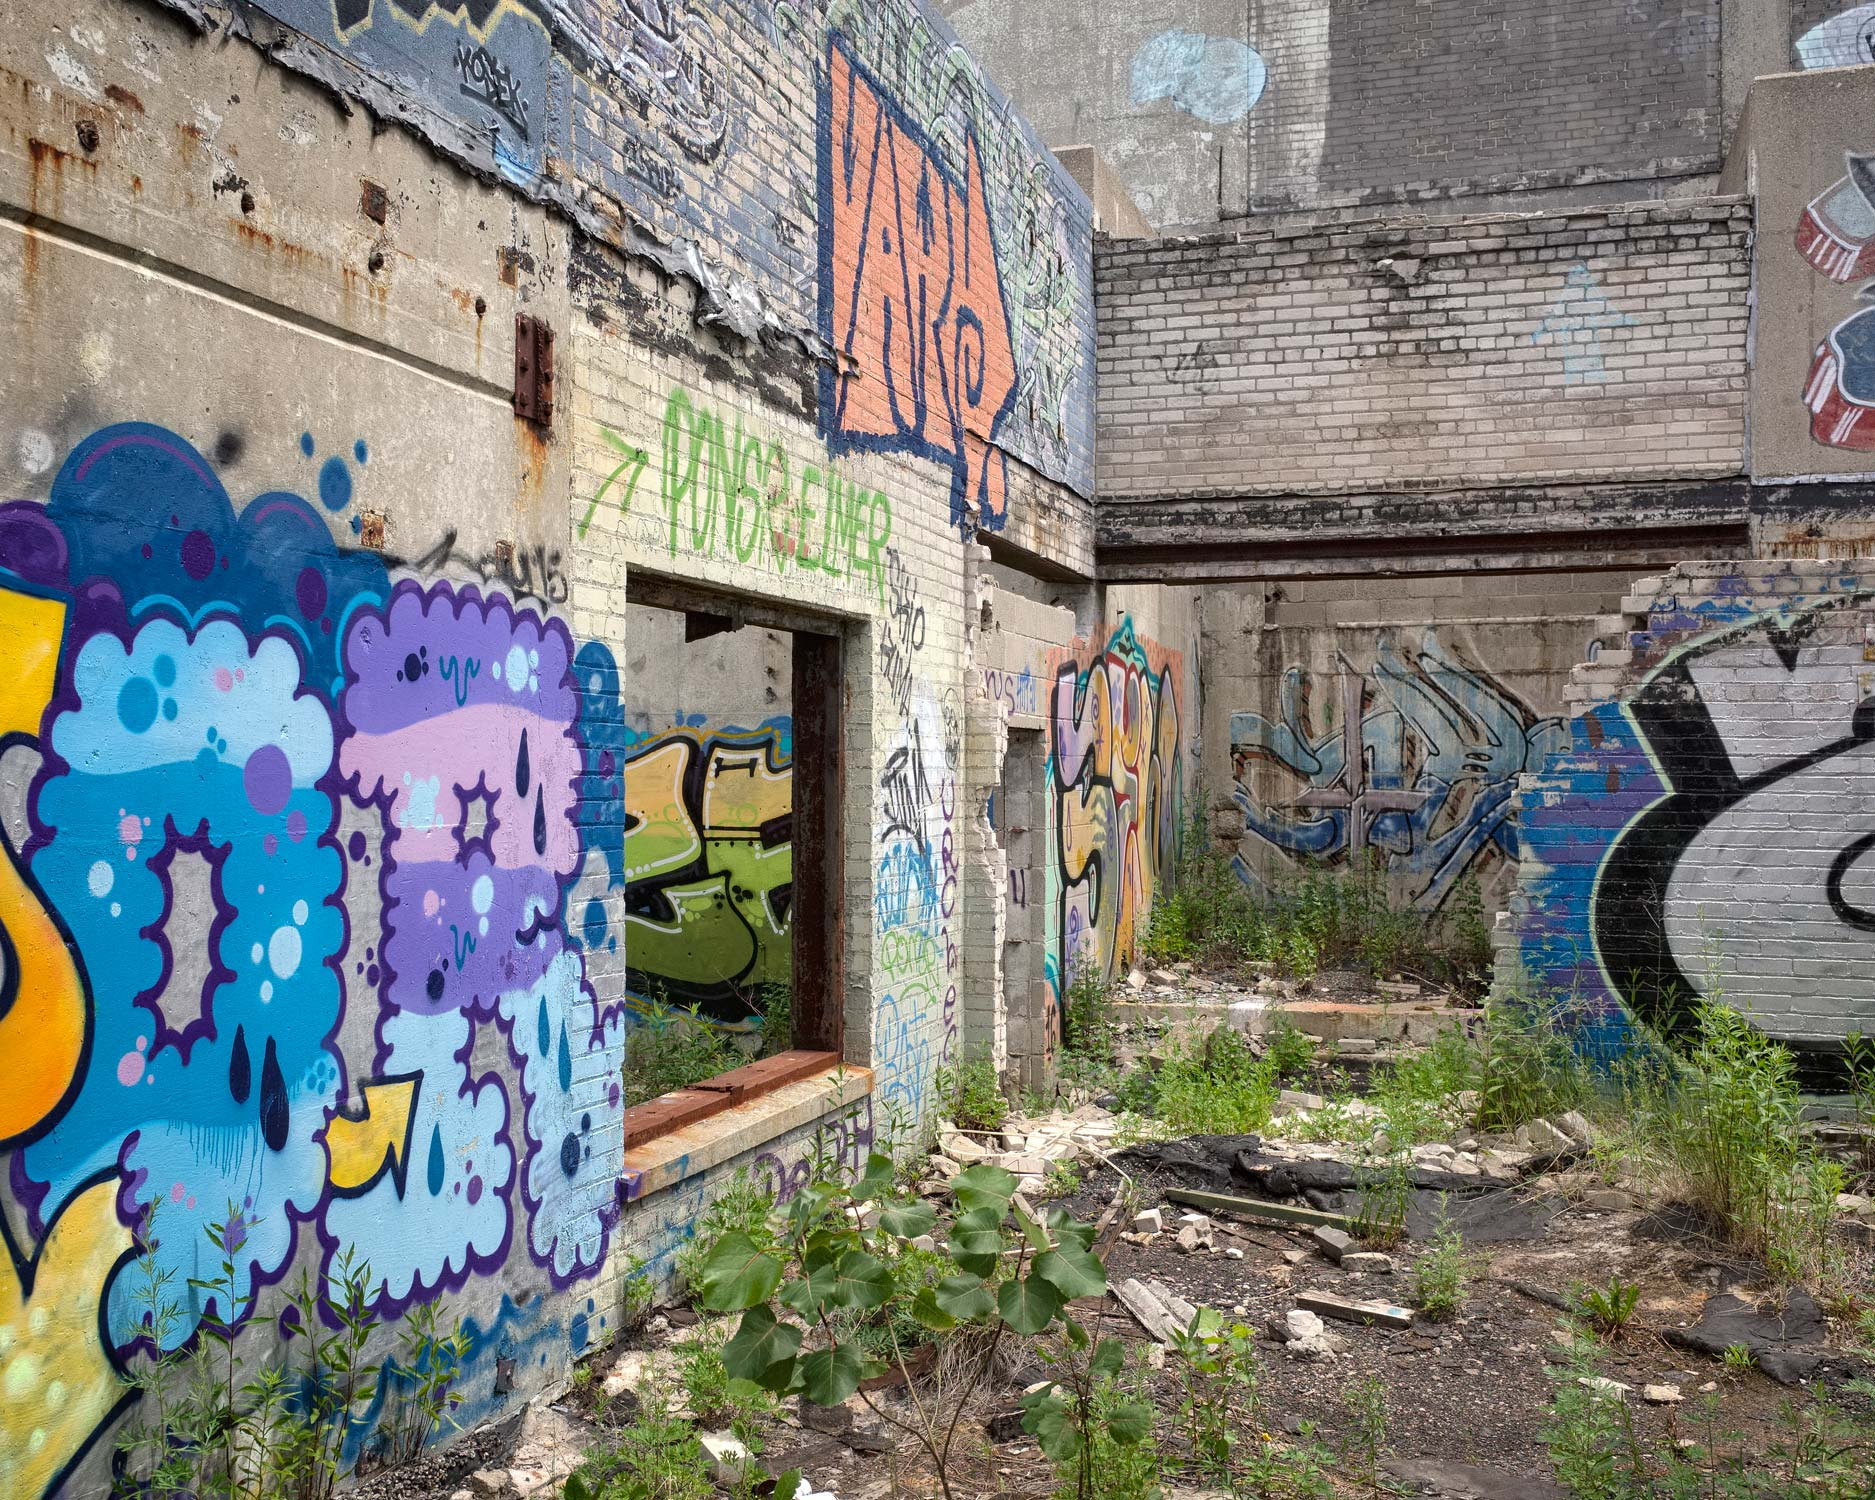 290_Detroit_ContinentalEngineFactory.jpg